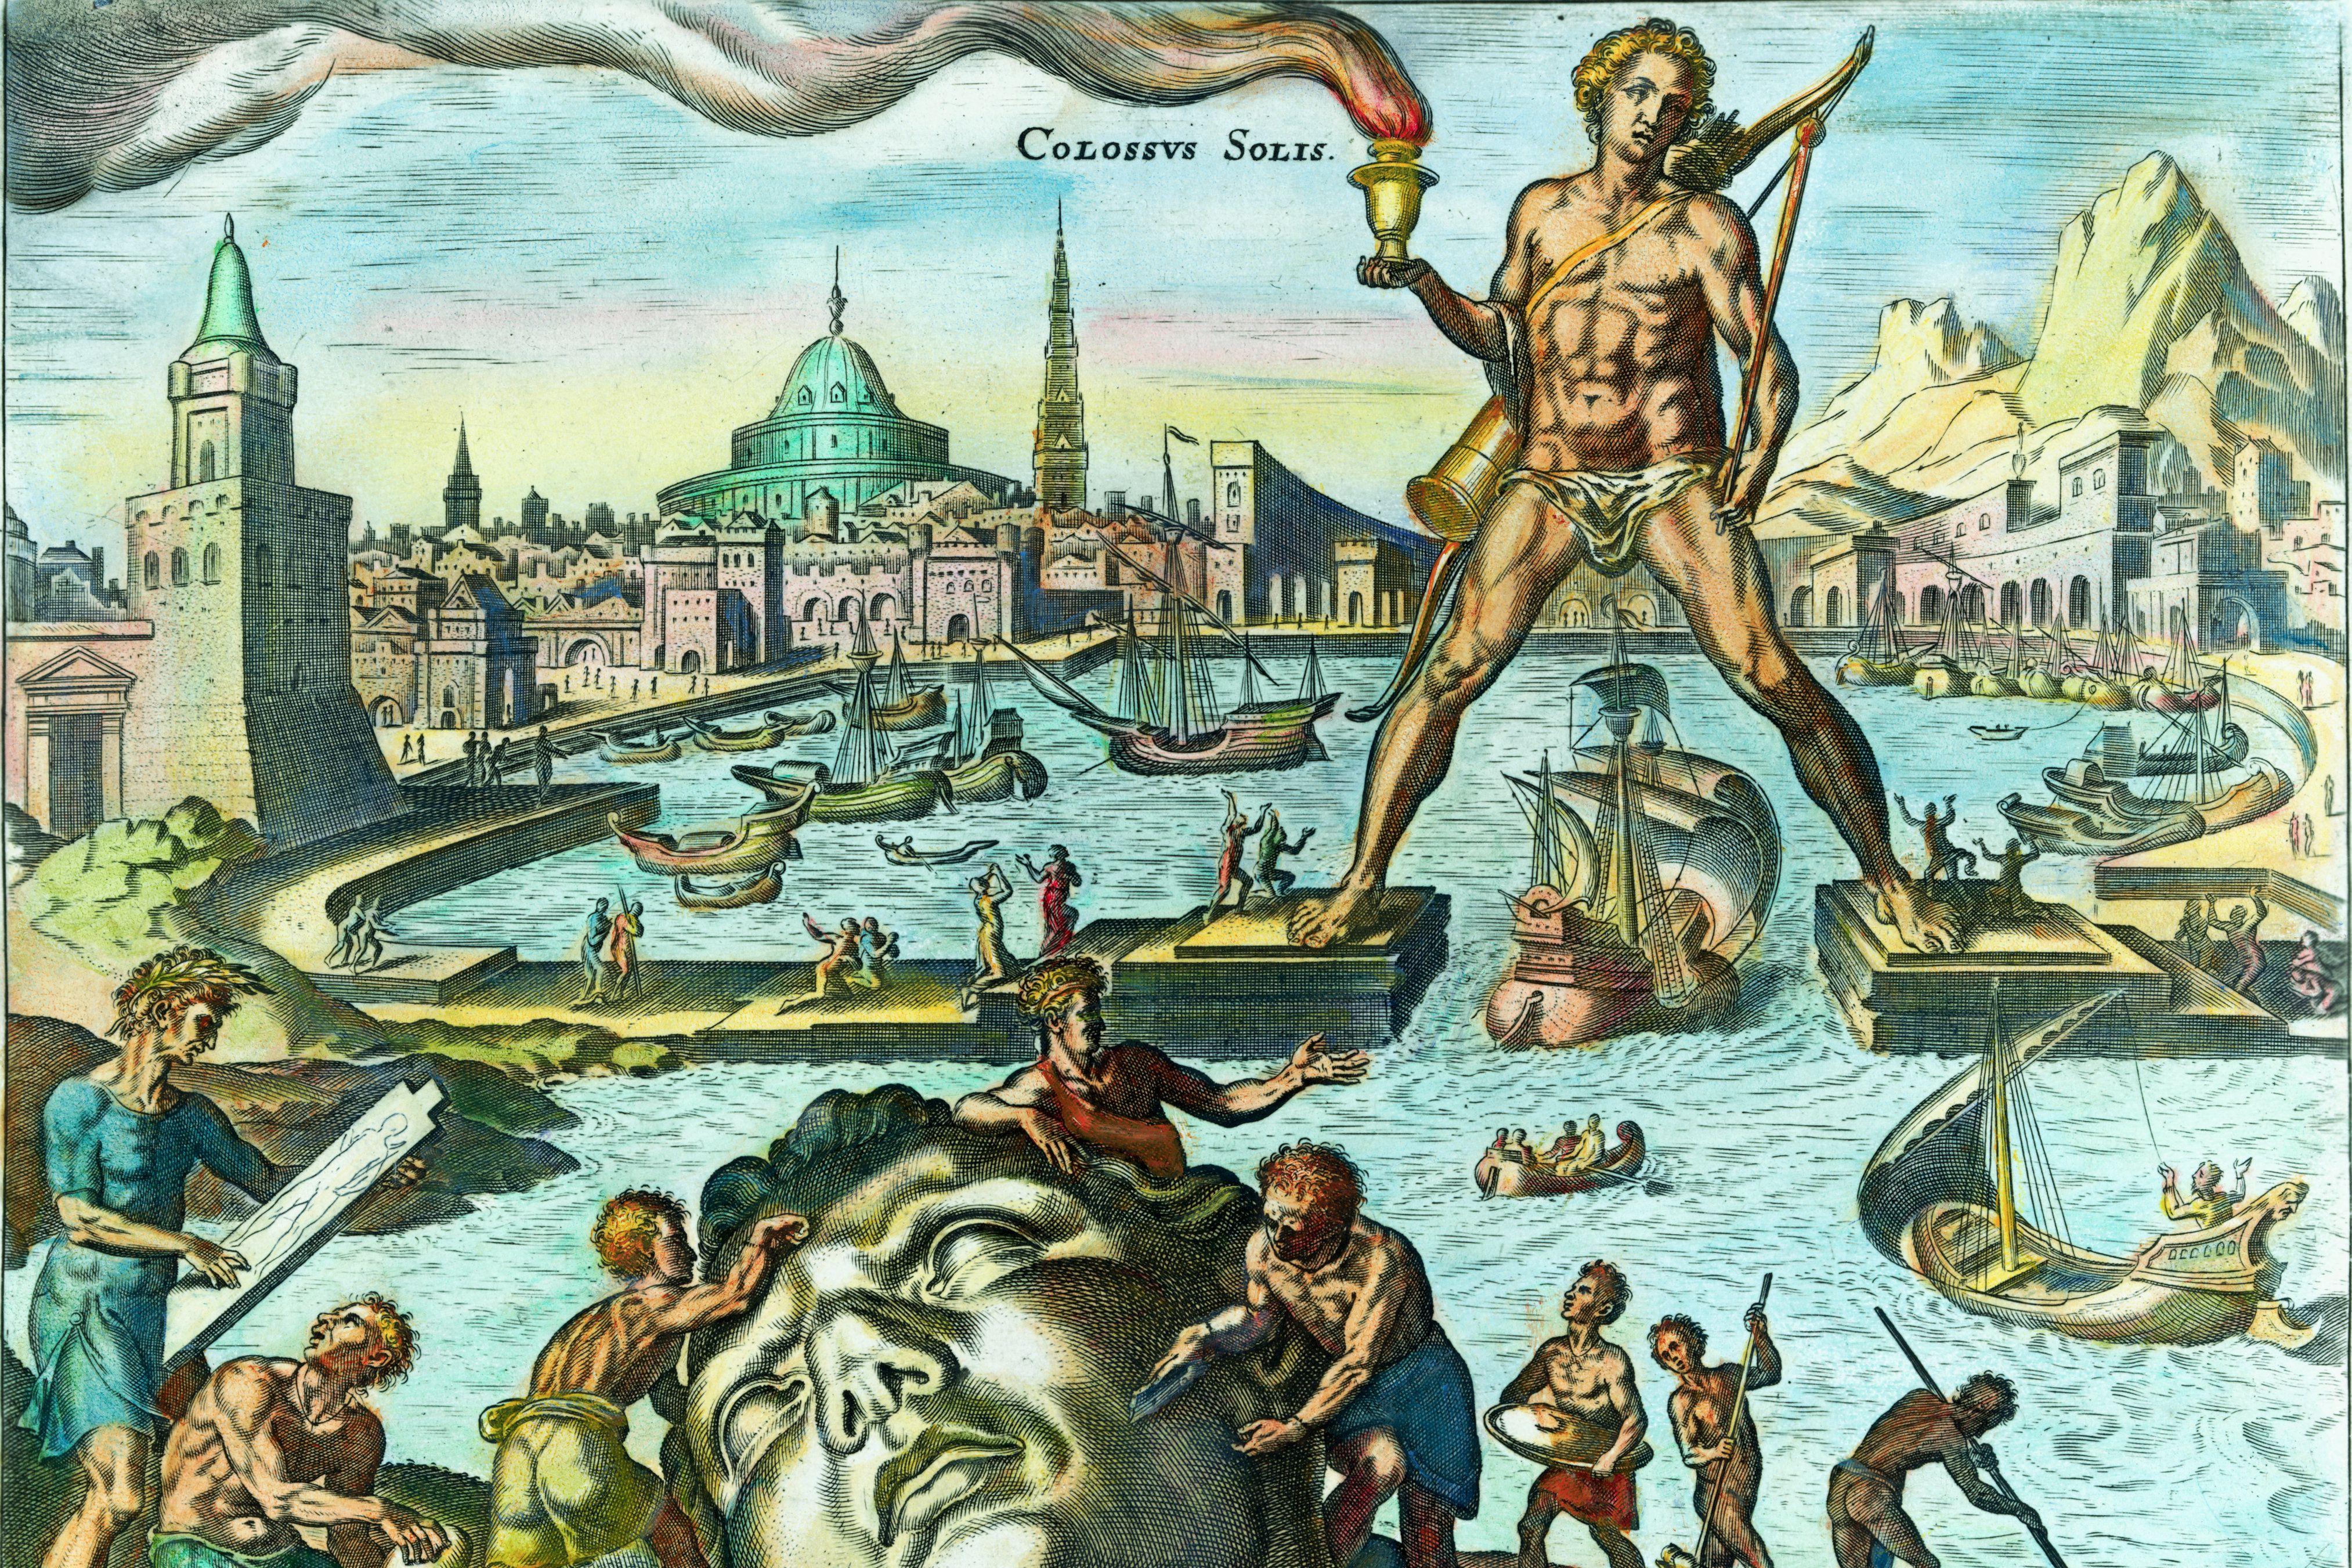 the Colossus ở Rhodes là gì?